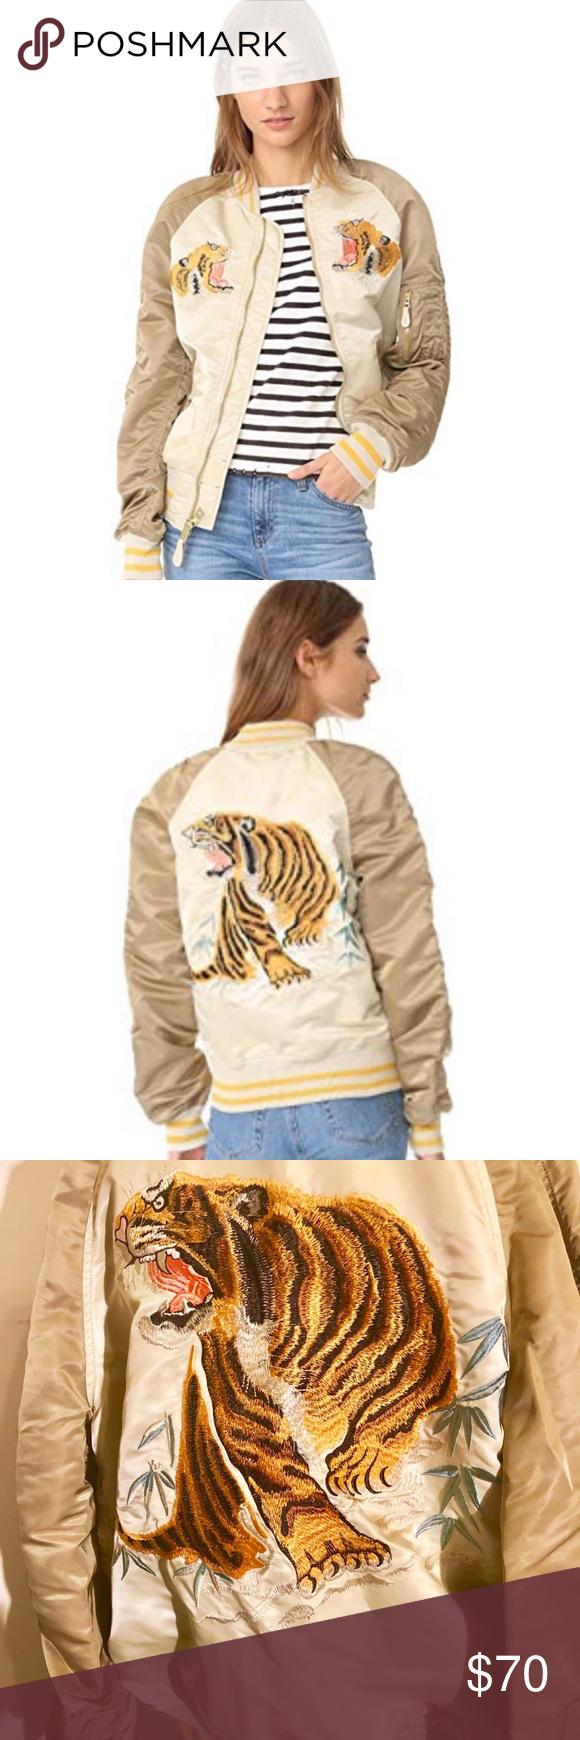 Alpha Industries Tiger Souvenir Flight Jacket EUC Limited Edition Tiger Souvenir…